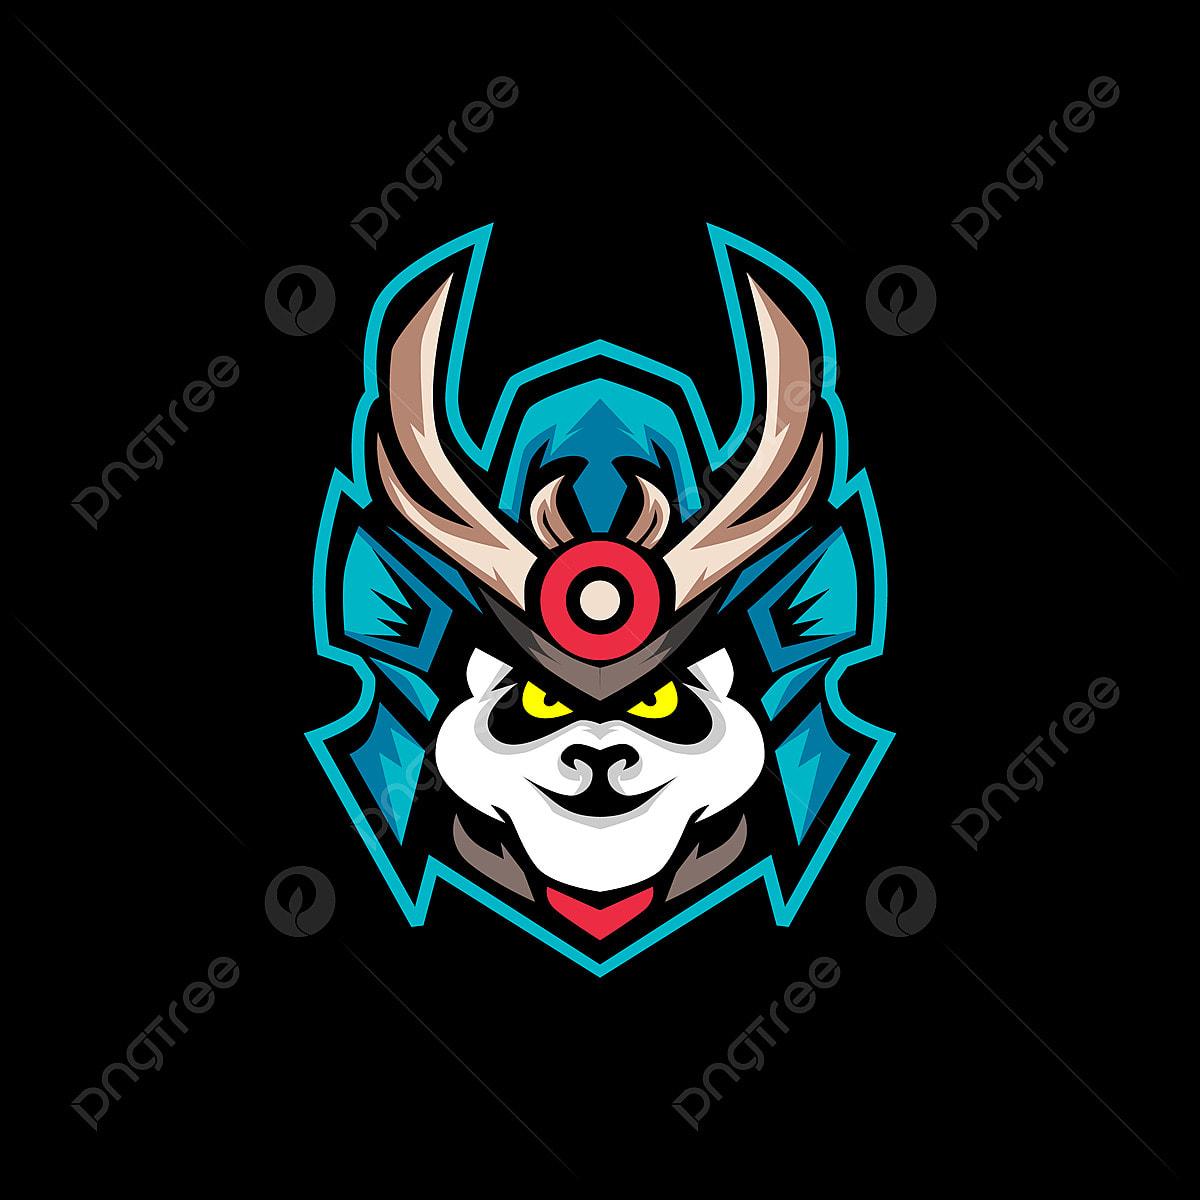 Samurai Panda E Sports Logo Gaming Mascot Animal Panda